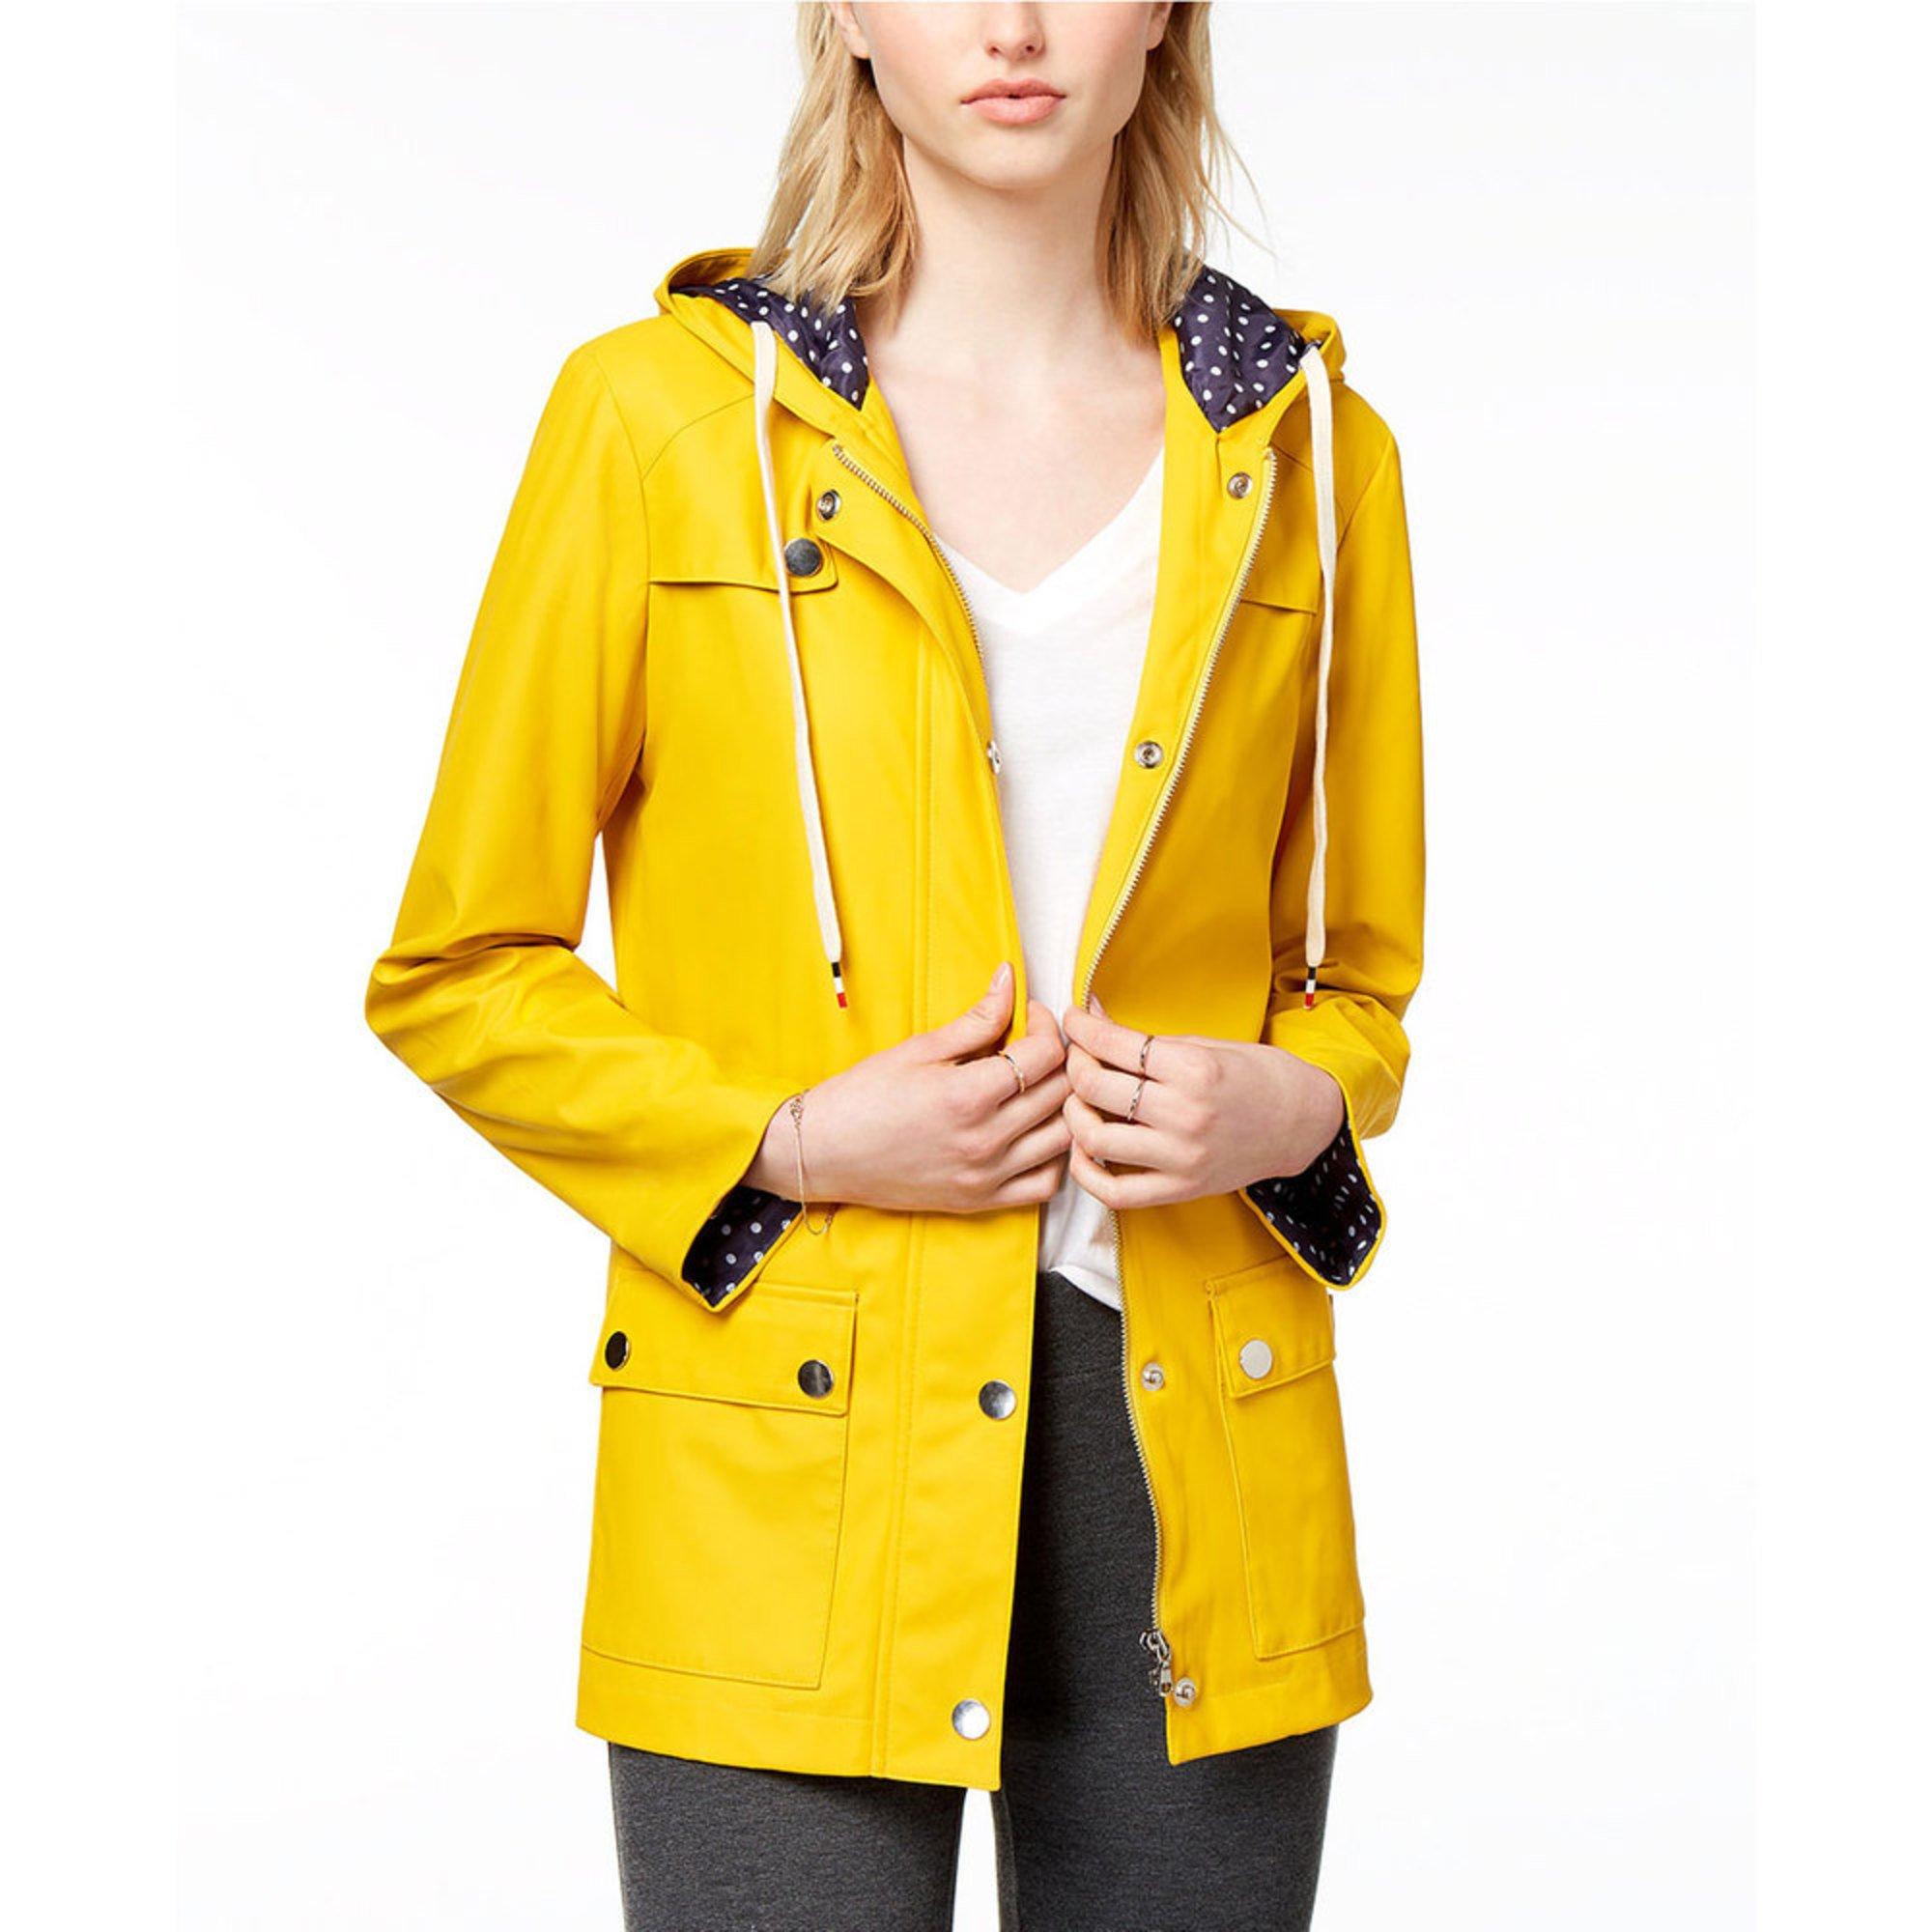 0fc43e2b62f1c Maison Jules. Maison Jules Women s Rubberized Rain Jacket with Dot Lining